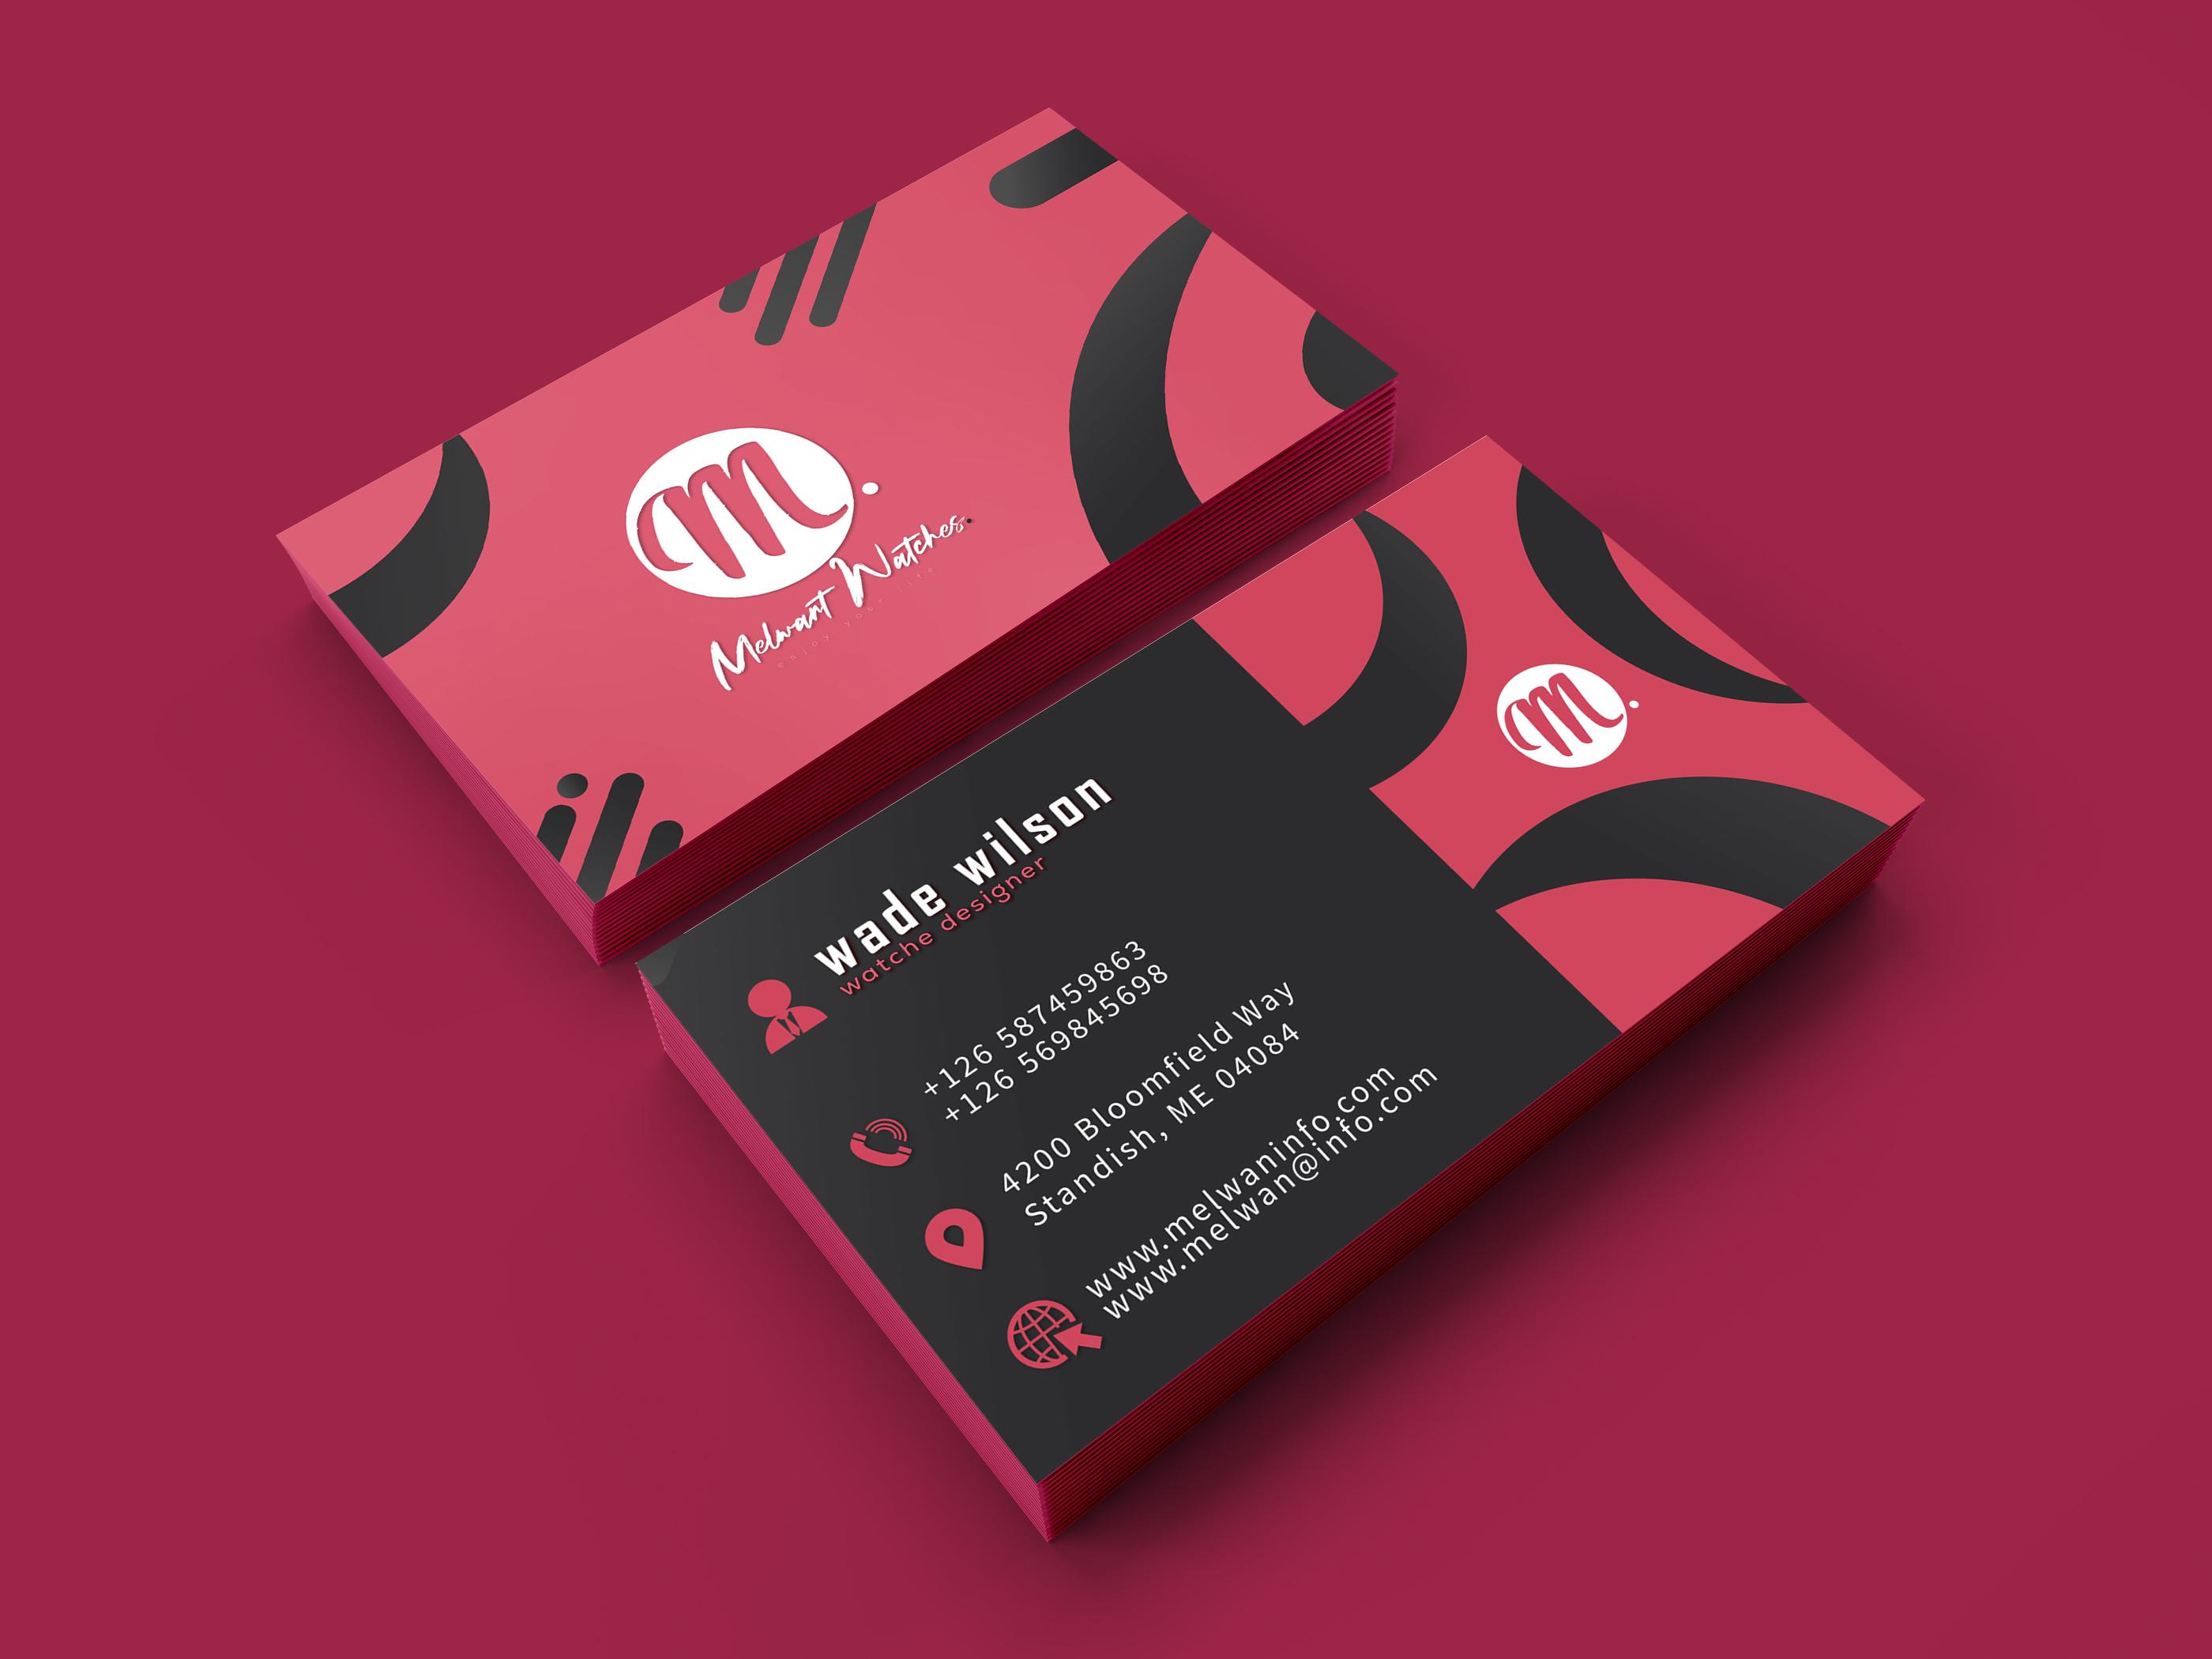 I will make a creative business card design